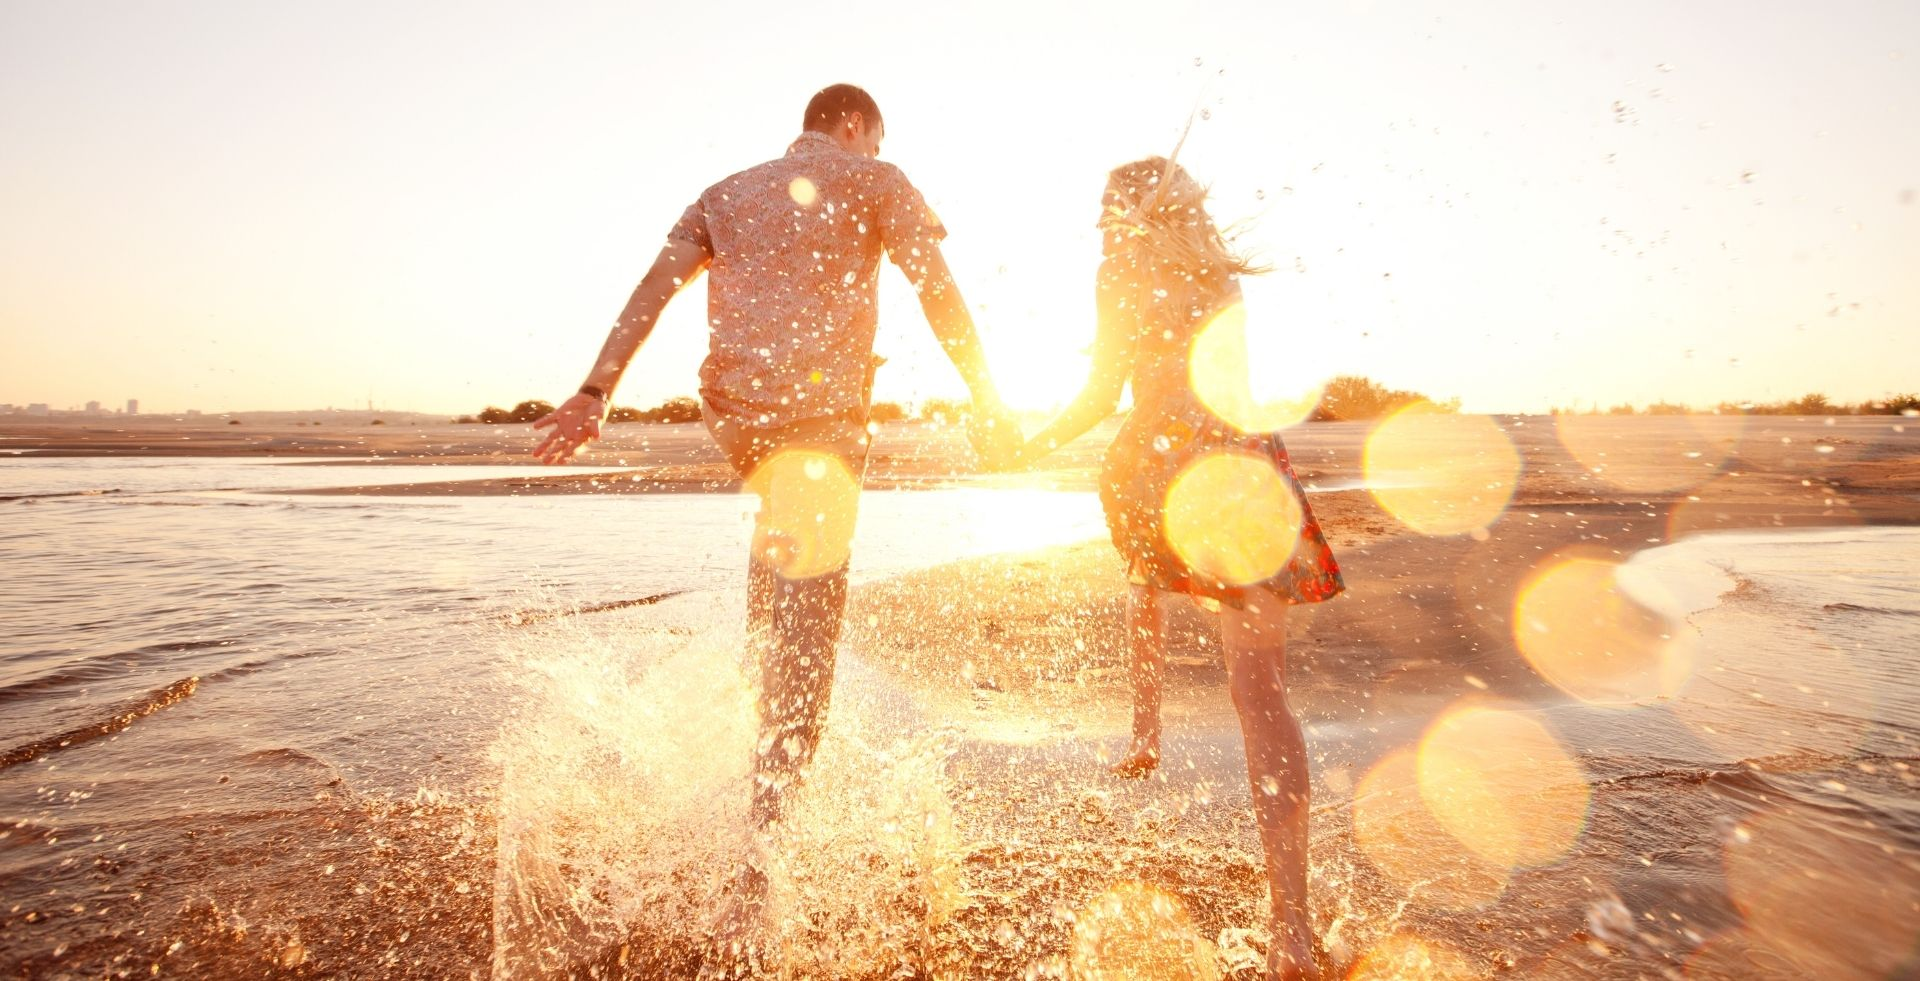 Pärchen am Strand beim Sonnenuntergang